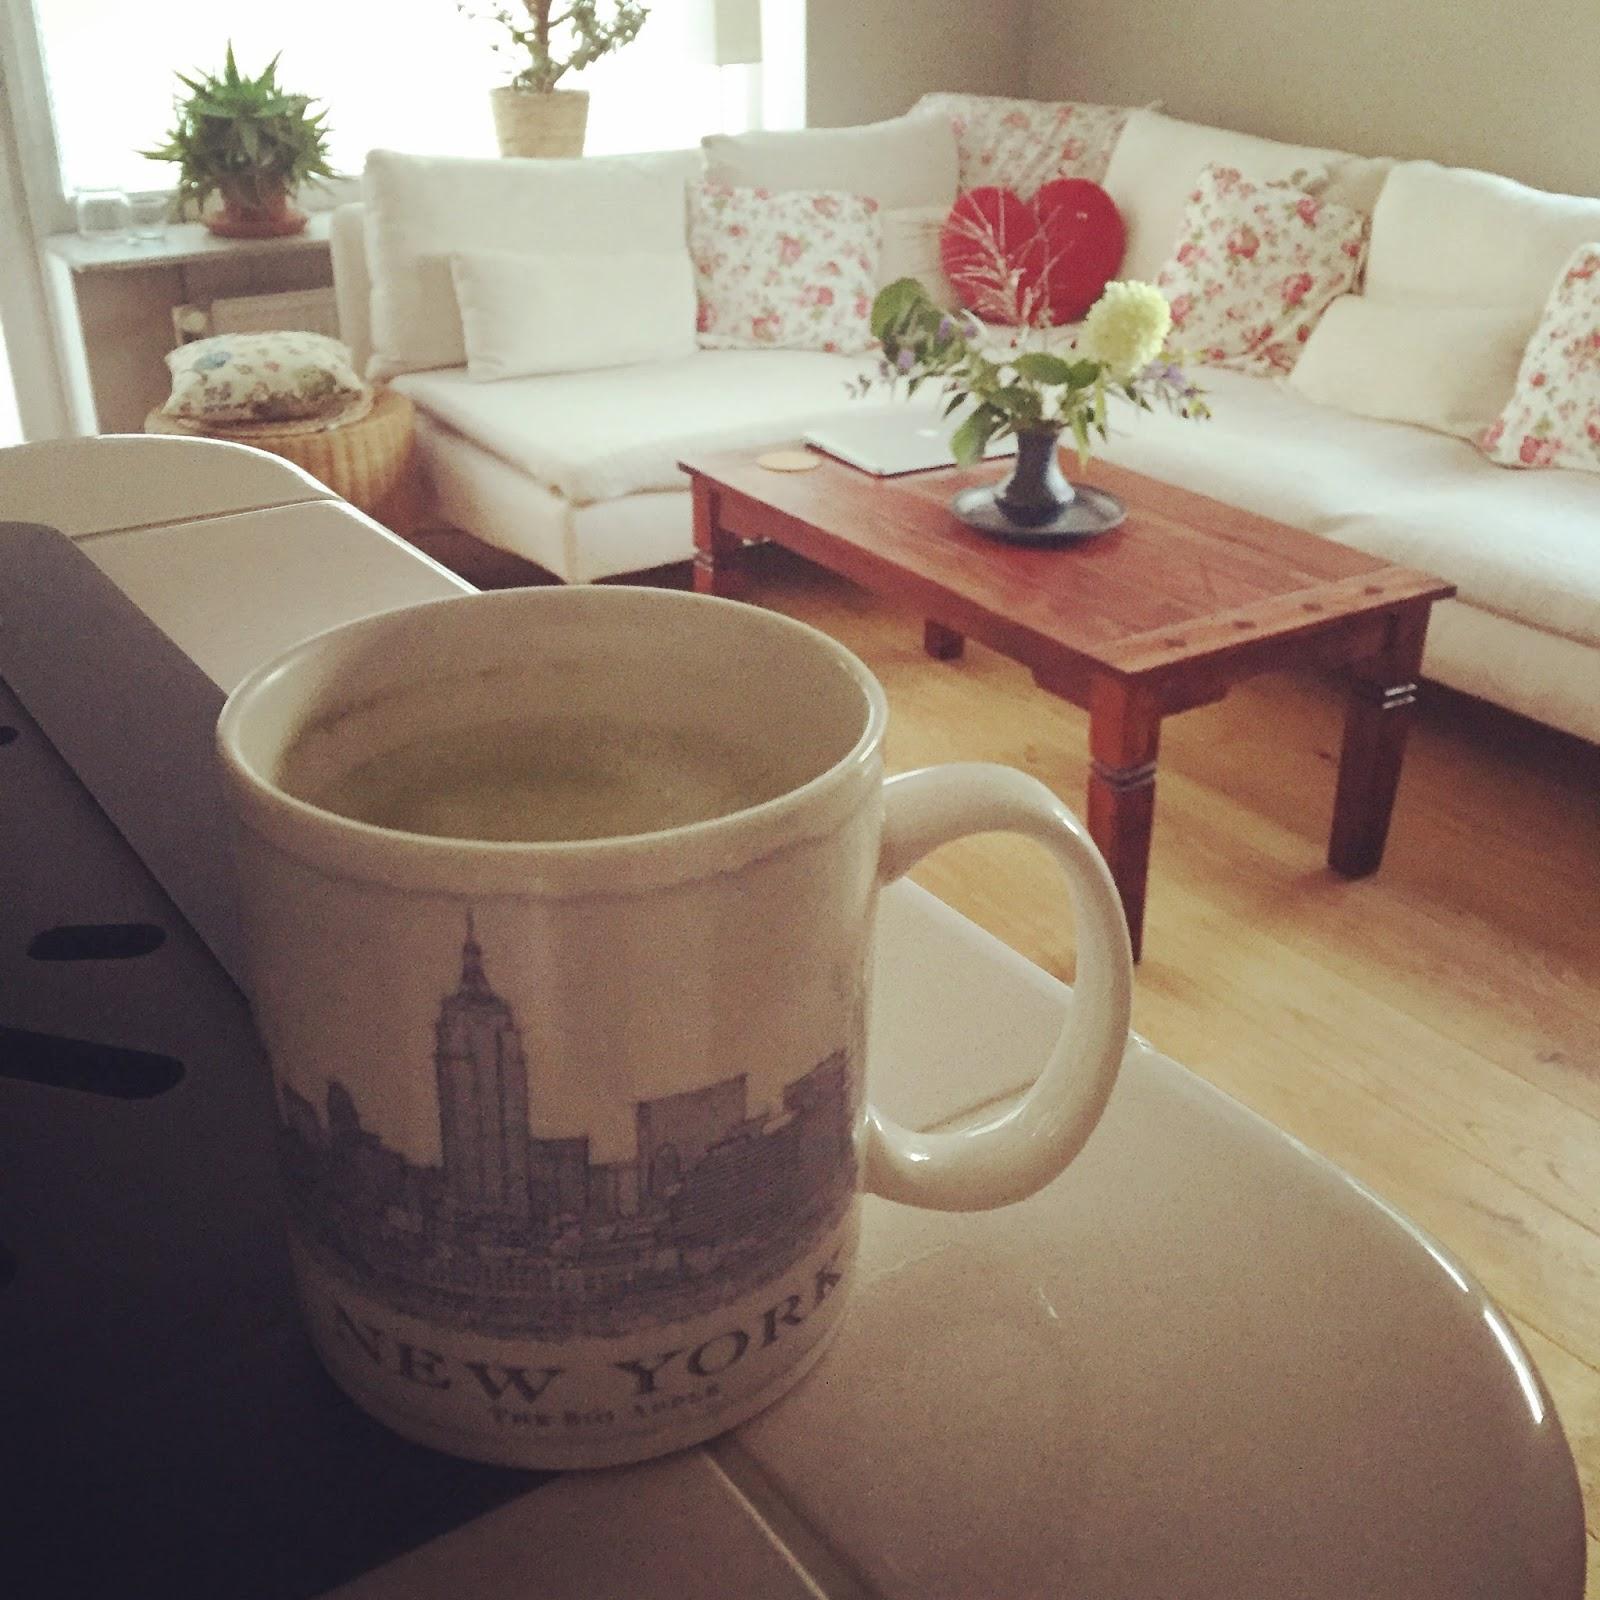 wochengl ck r ckblick 02 09 sunnys haus. Black Bedroom Furniture Sets. Home Design Ideas